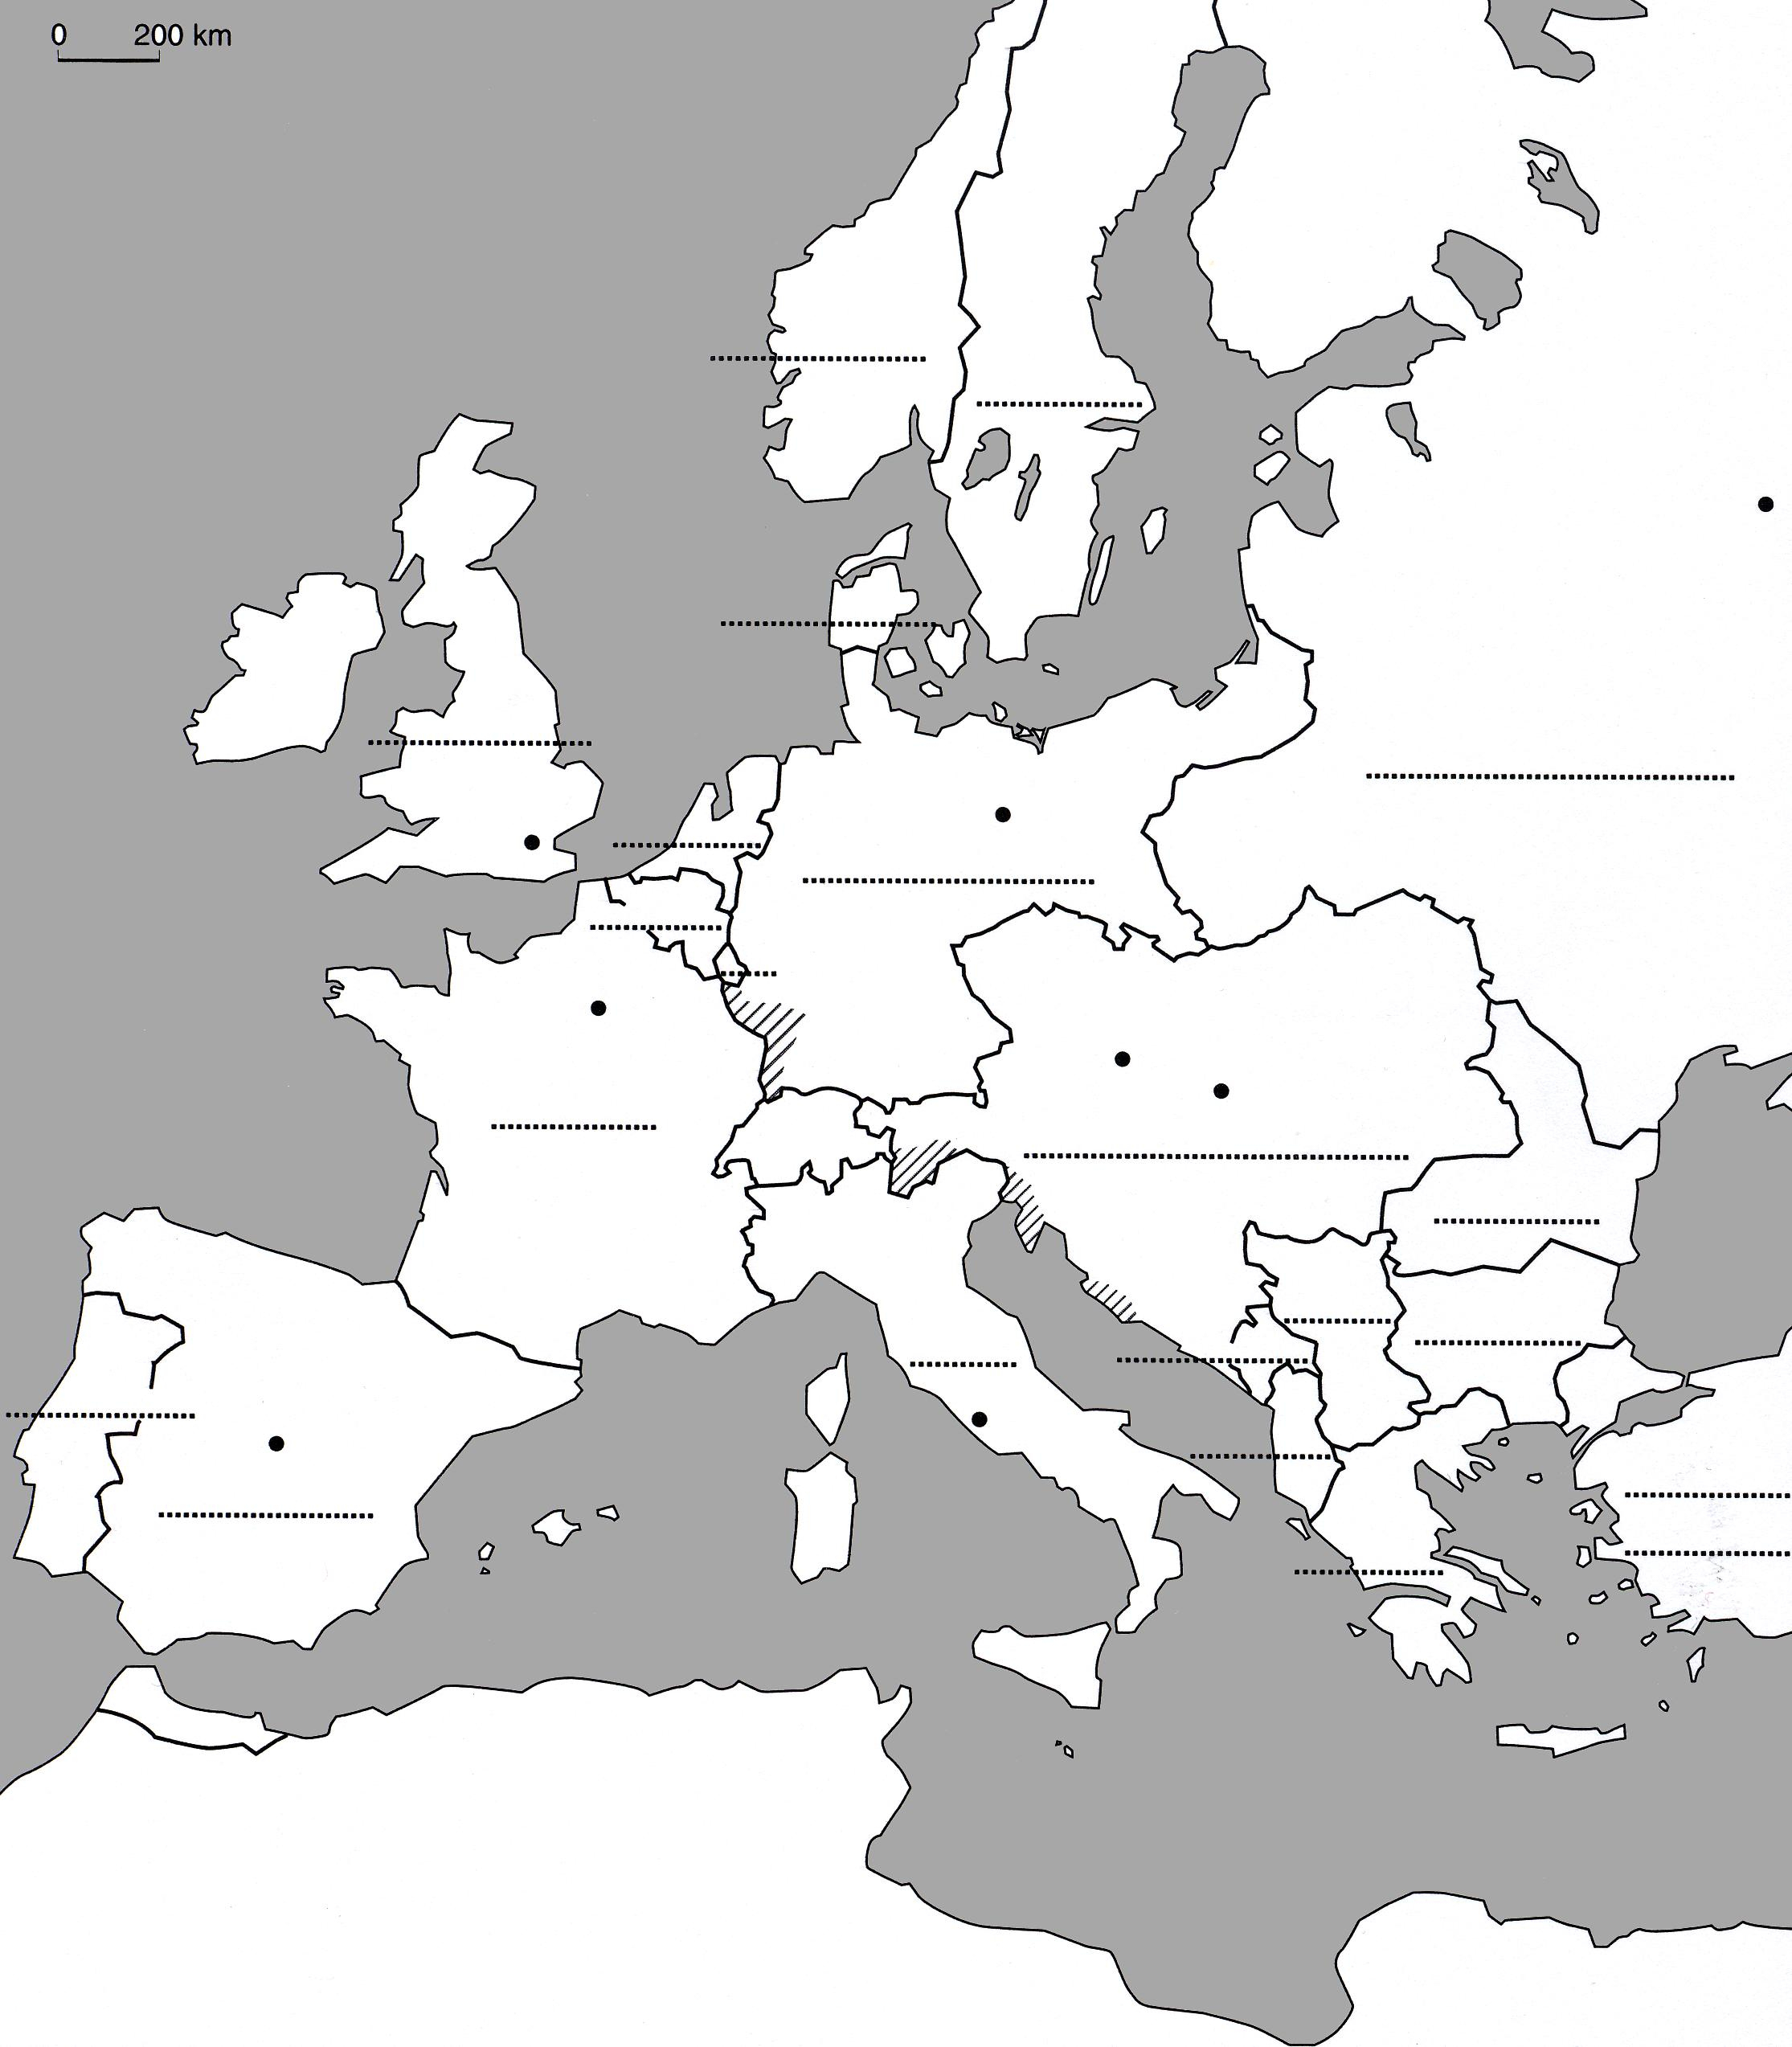 Carte Europe Cm1 À Compléter | My Blog encequiconcerne Carte Europe Vierge Cm1